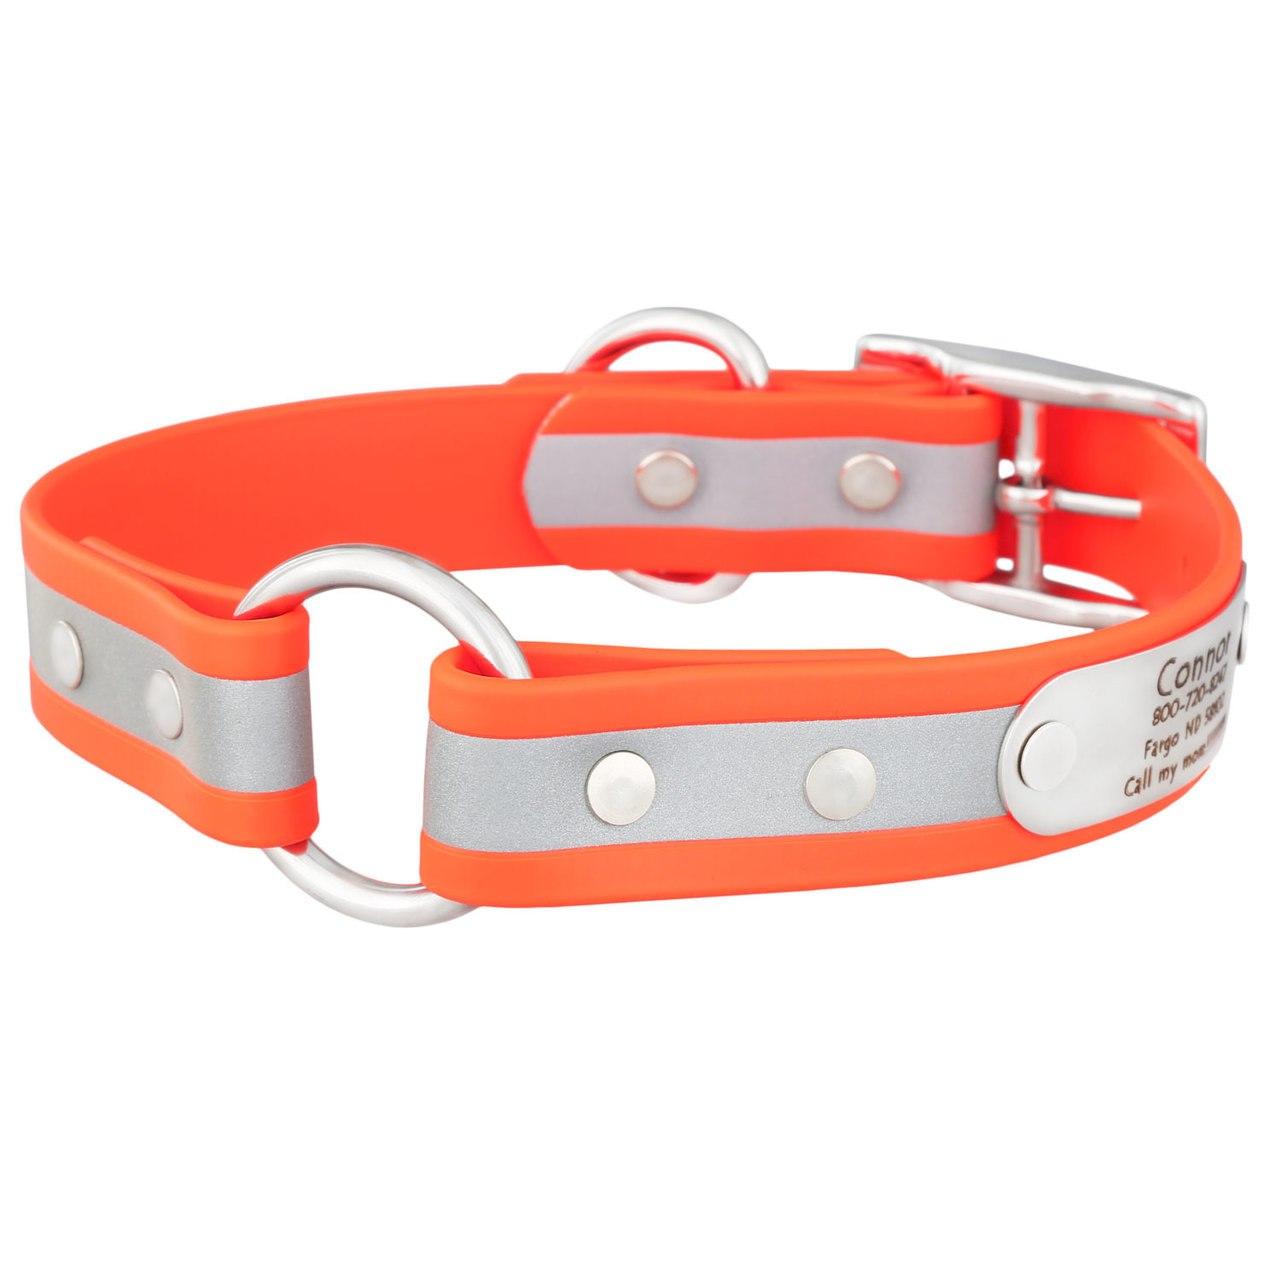 Personalized Waterproof Reflective Safety Dog Collar Orange